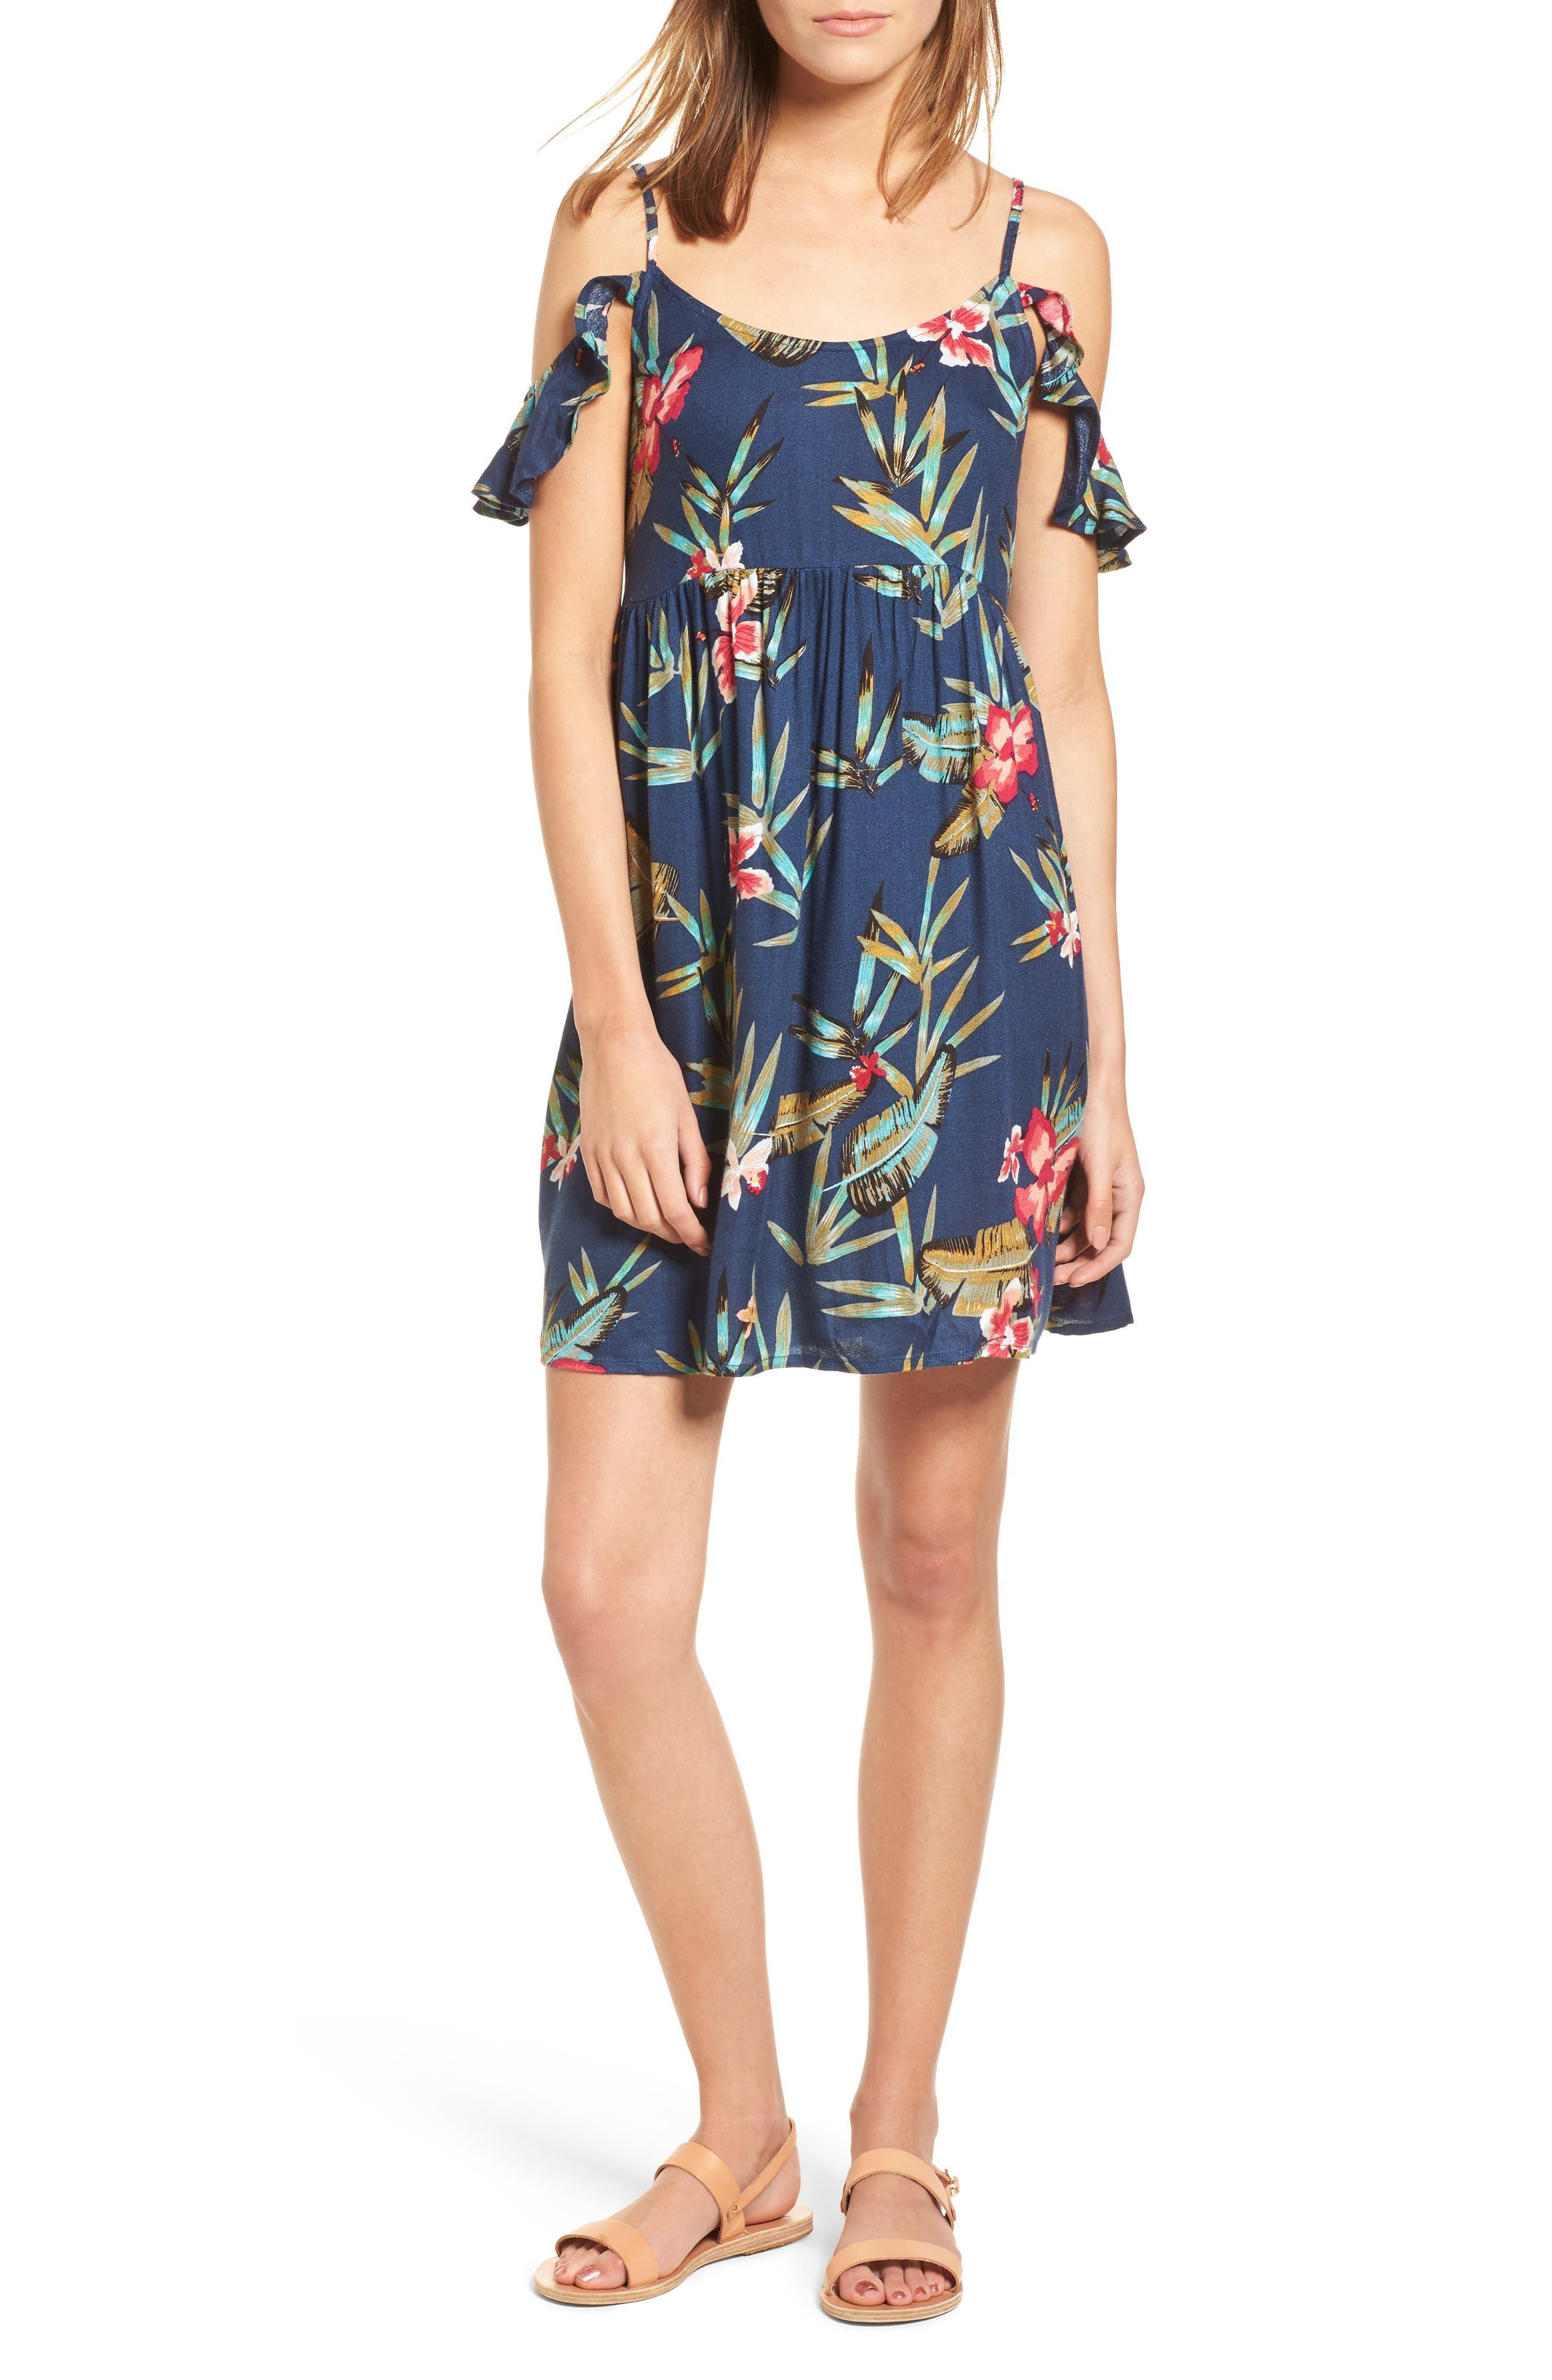 Do It My Way Cold Shoulder Sundress,                             Main thumbnail 1, color,                             Dress Blue Isle